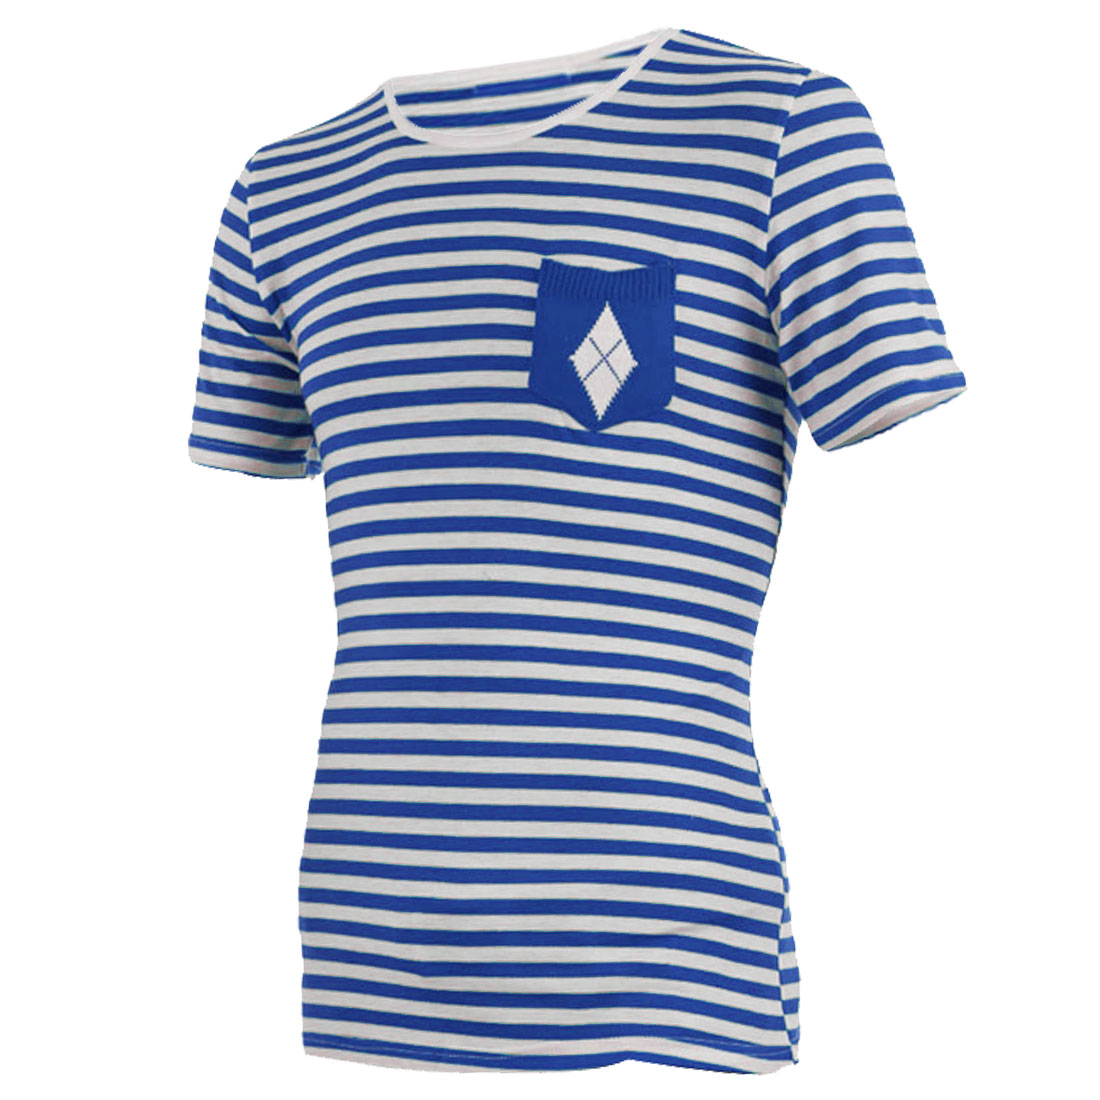 Men Round Neck Pullover Stripes Stylish Shirt Blue White S